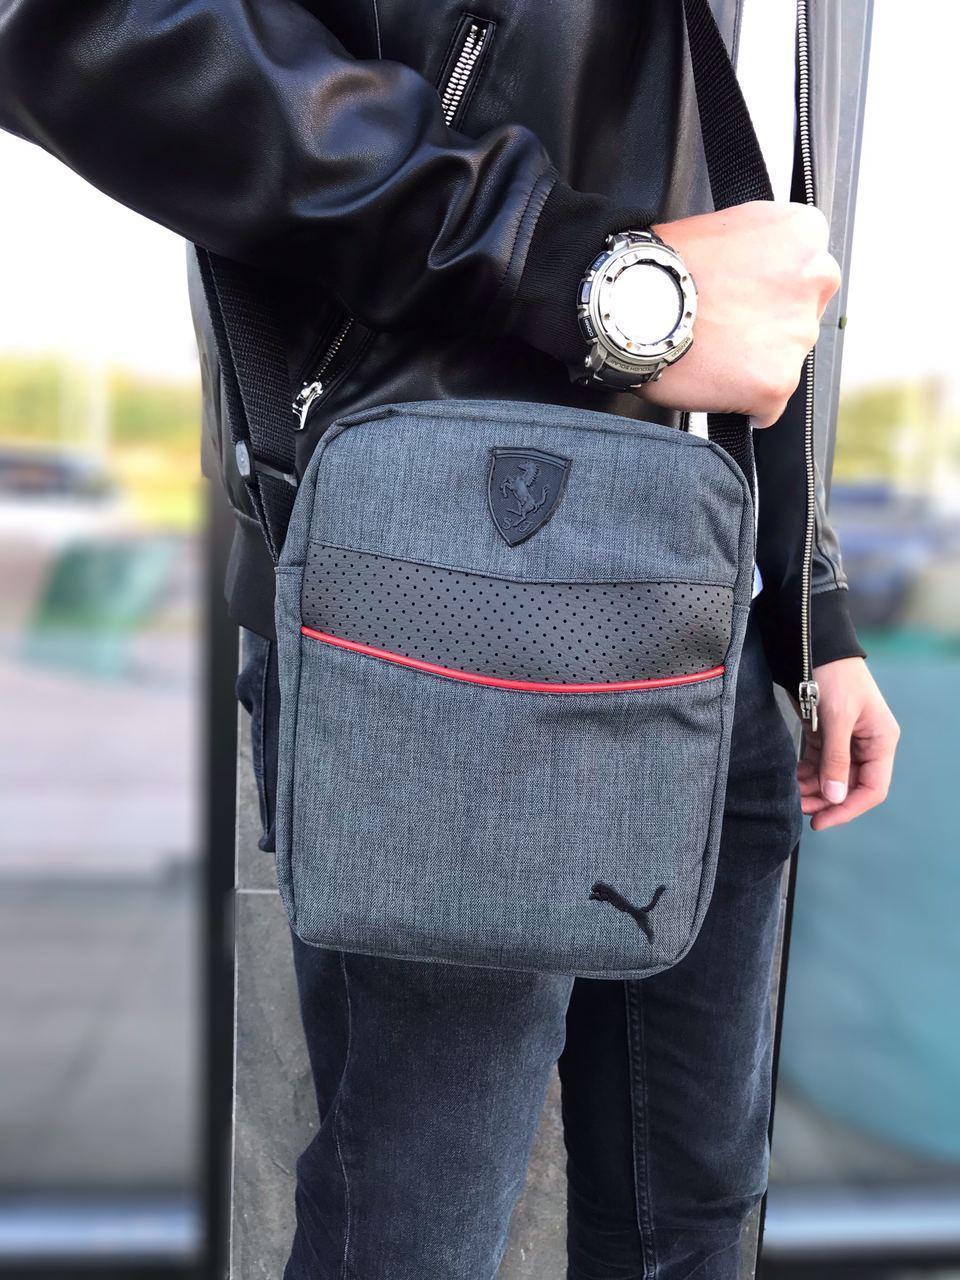 Барсетка Puma Мужская сумка через плечо Мессенджер Женская